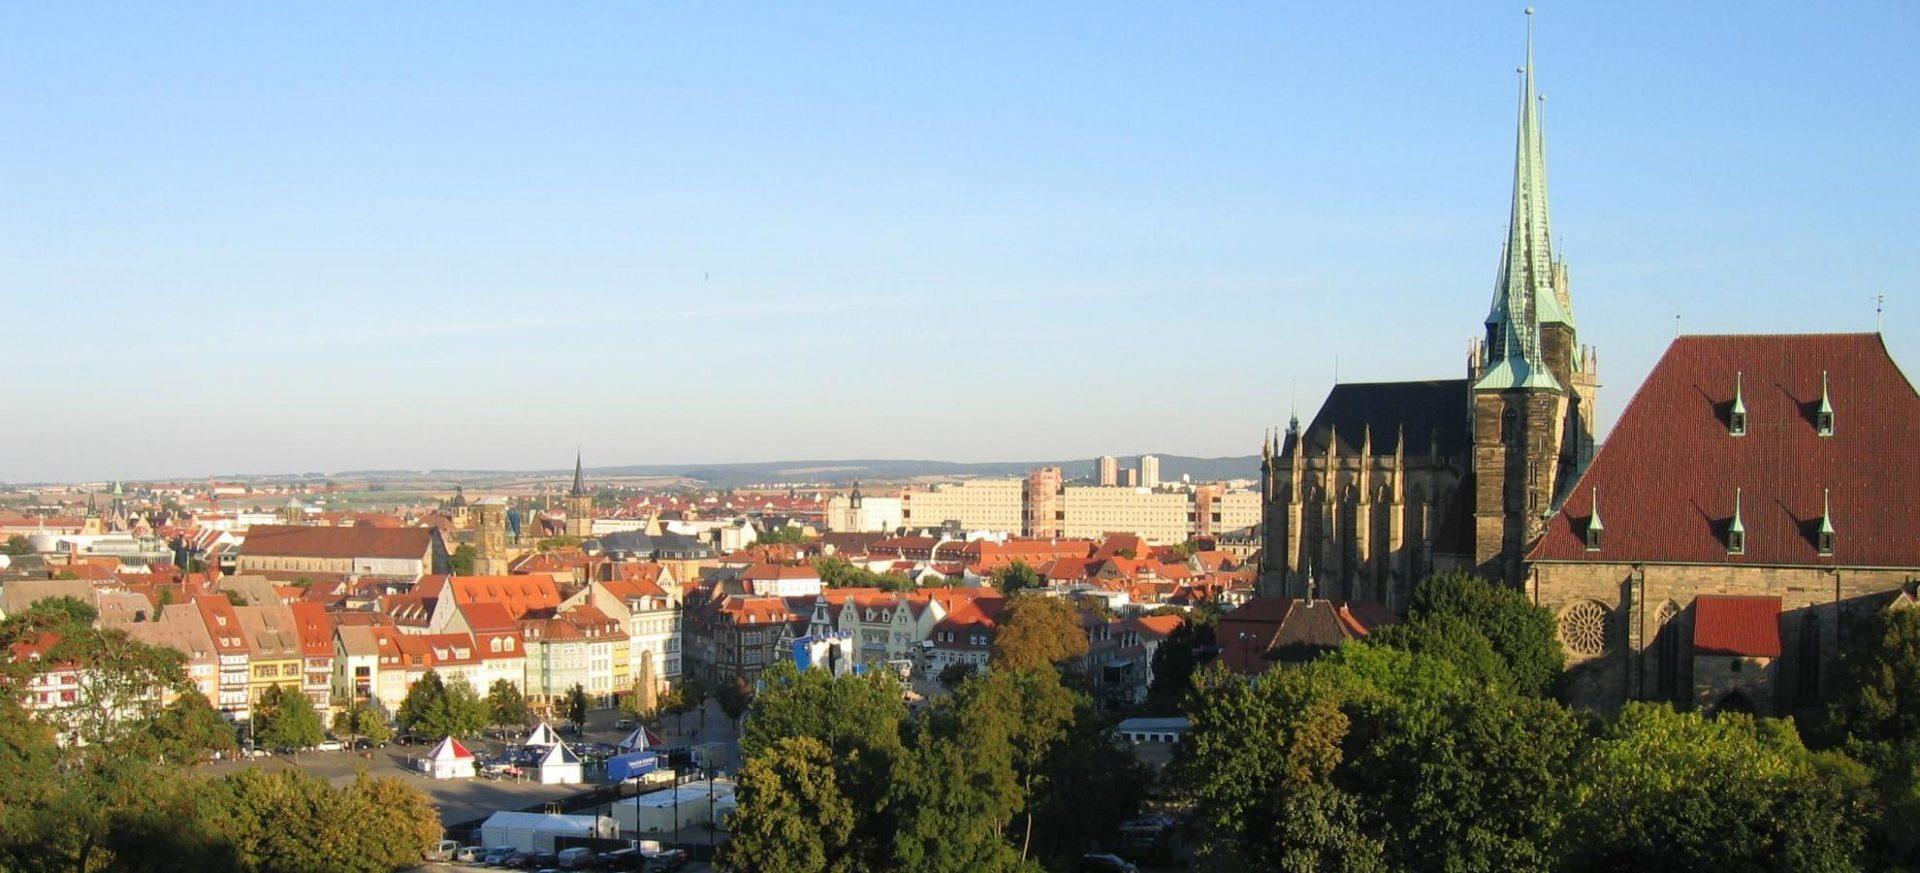 Radisson Blu Hotel Erfurt Umgebung / Surroundings